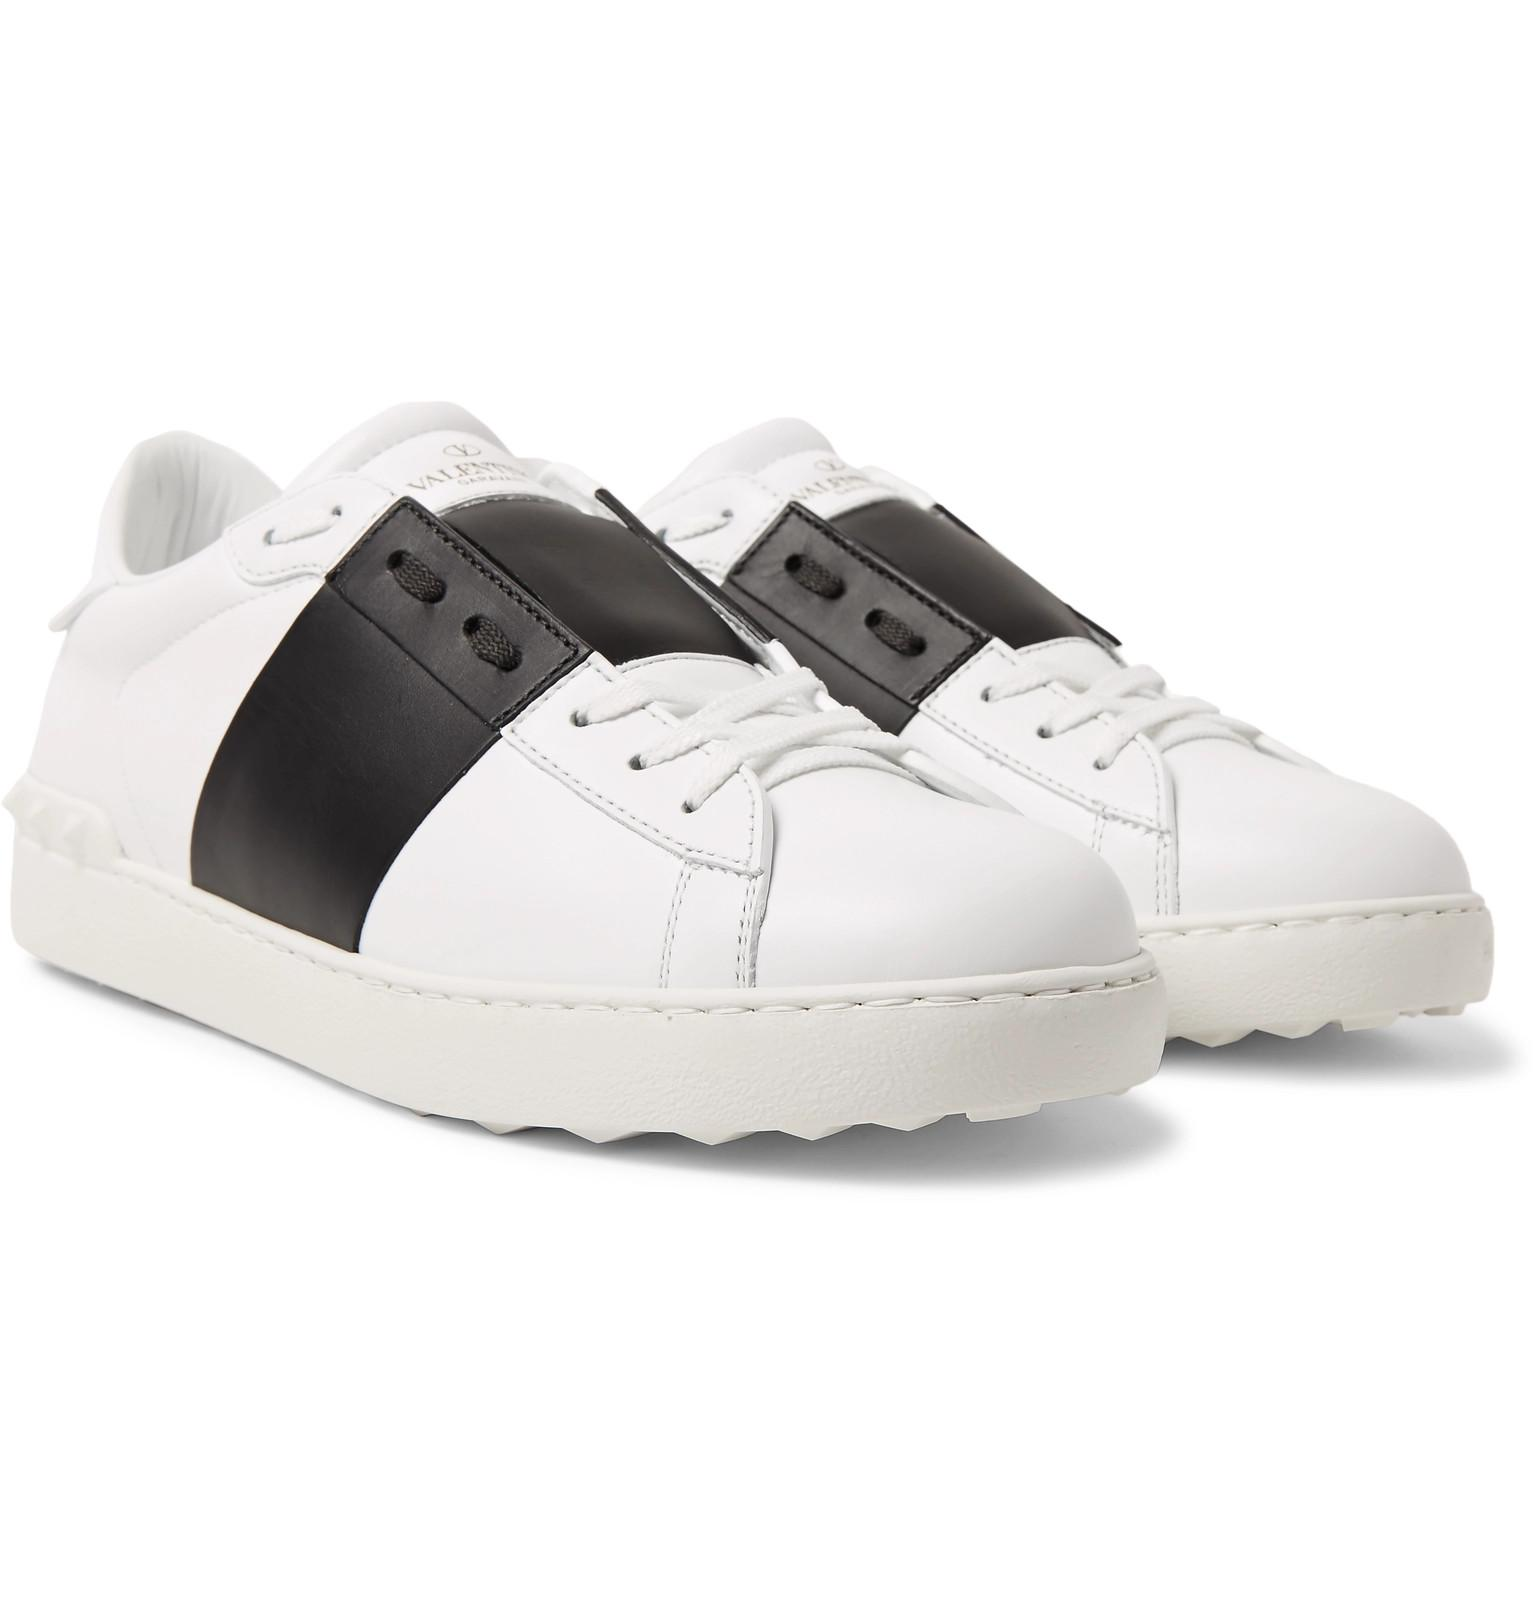 Garavani Open Striped Leather Slip-on Sneakers Valentino gGUiWQ